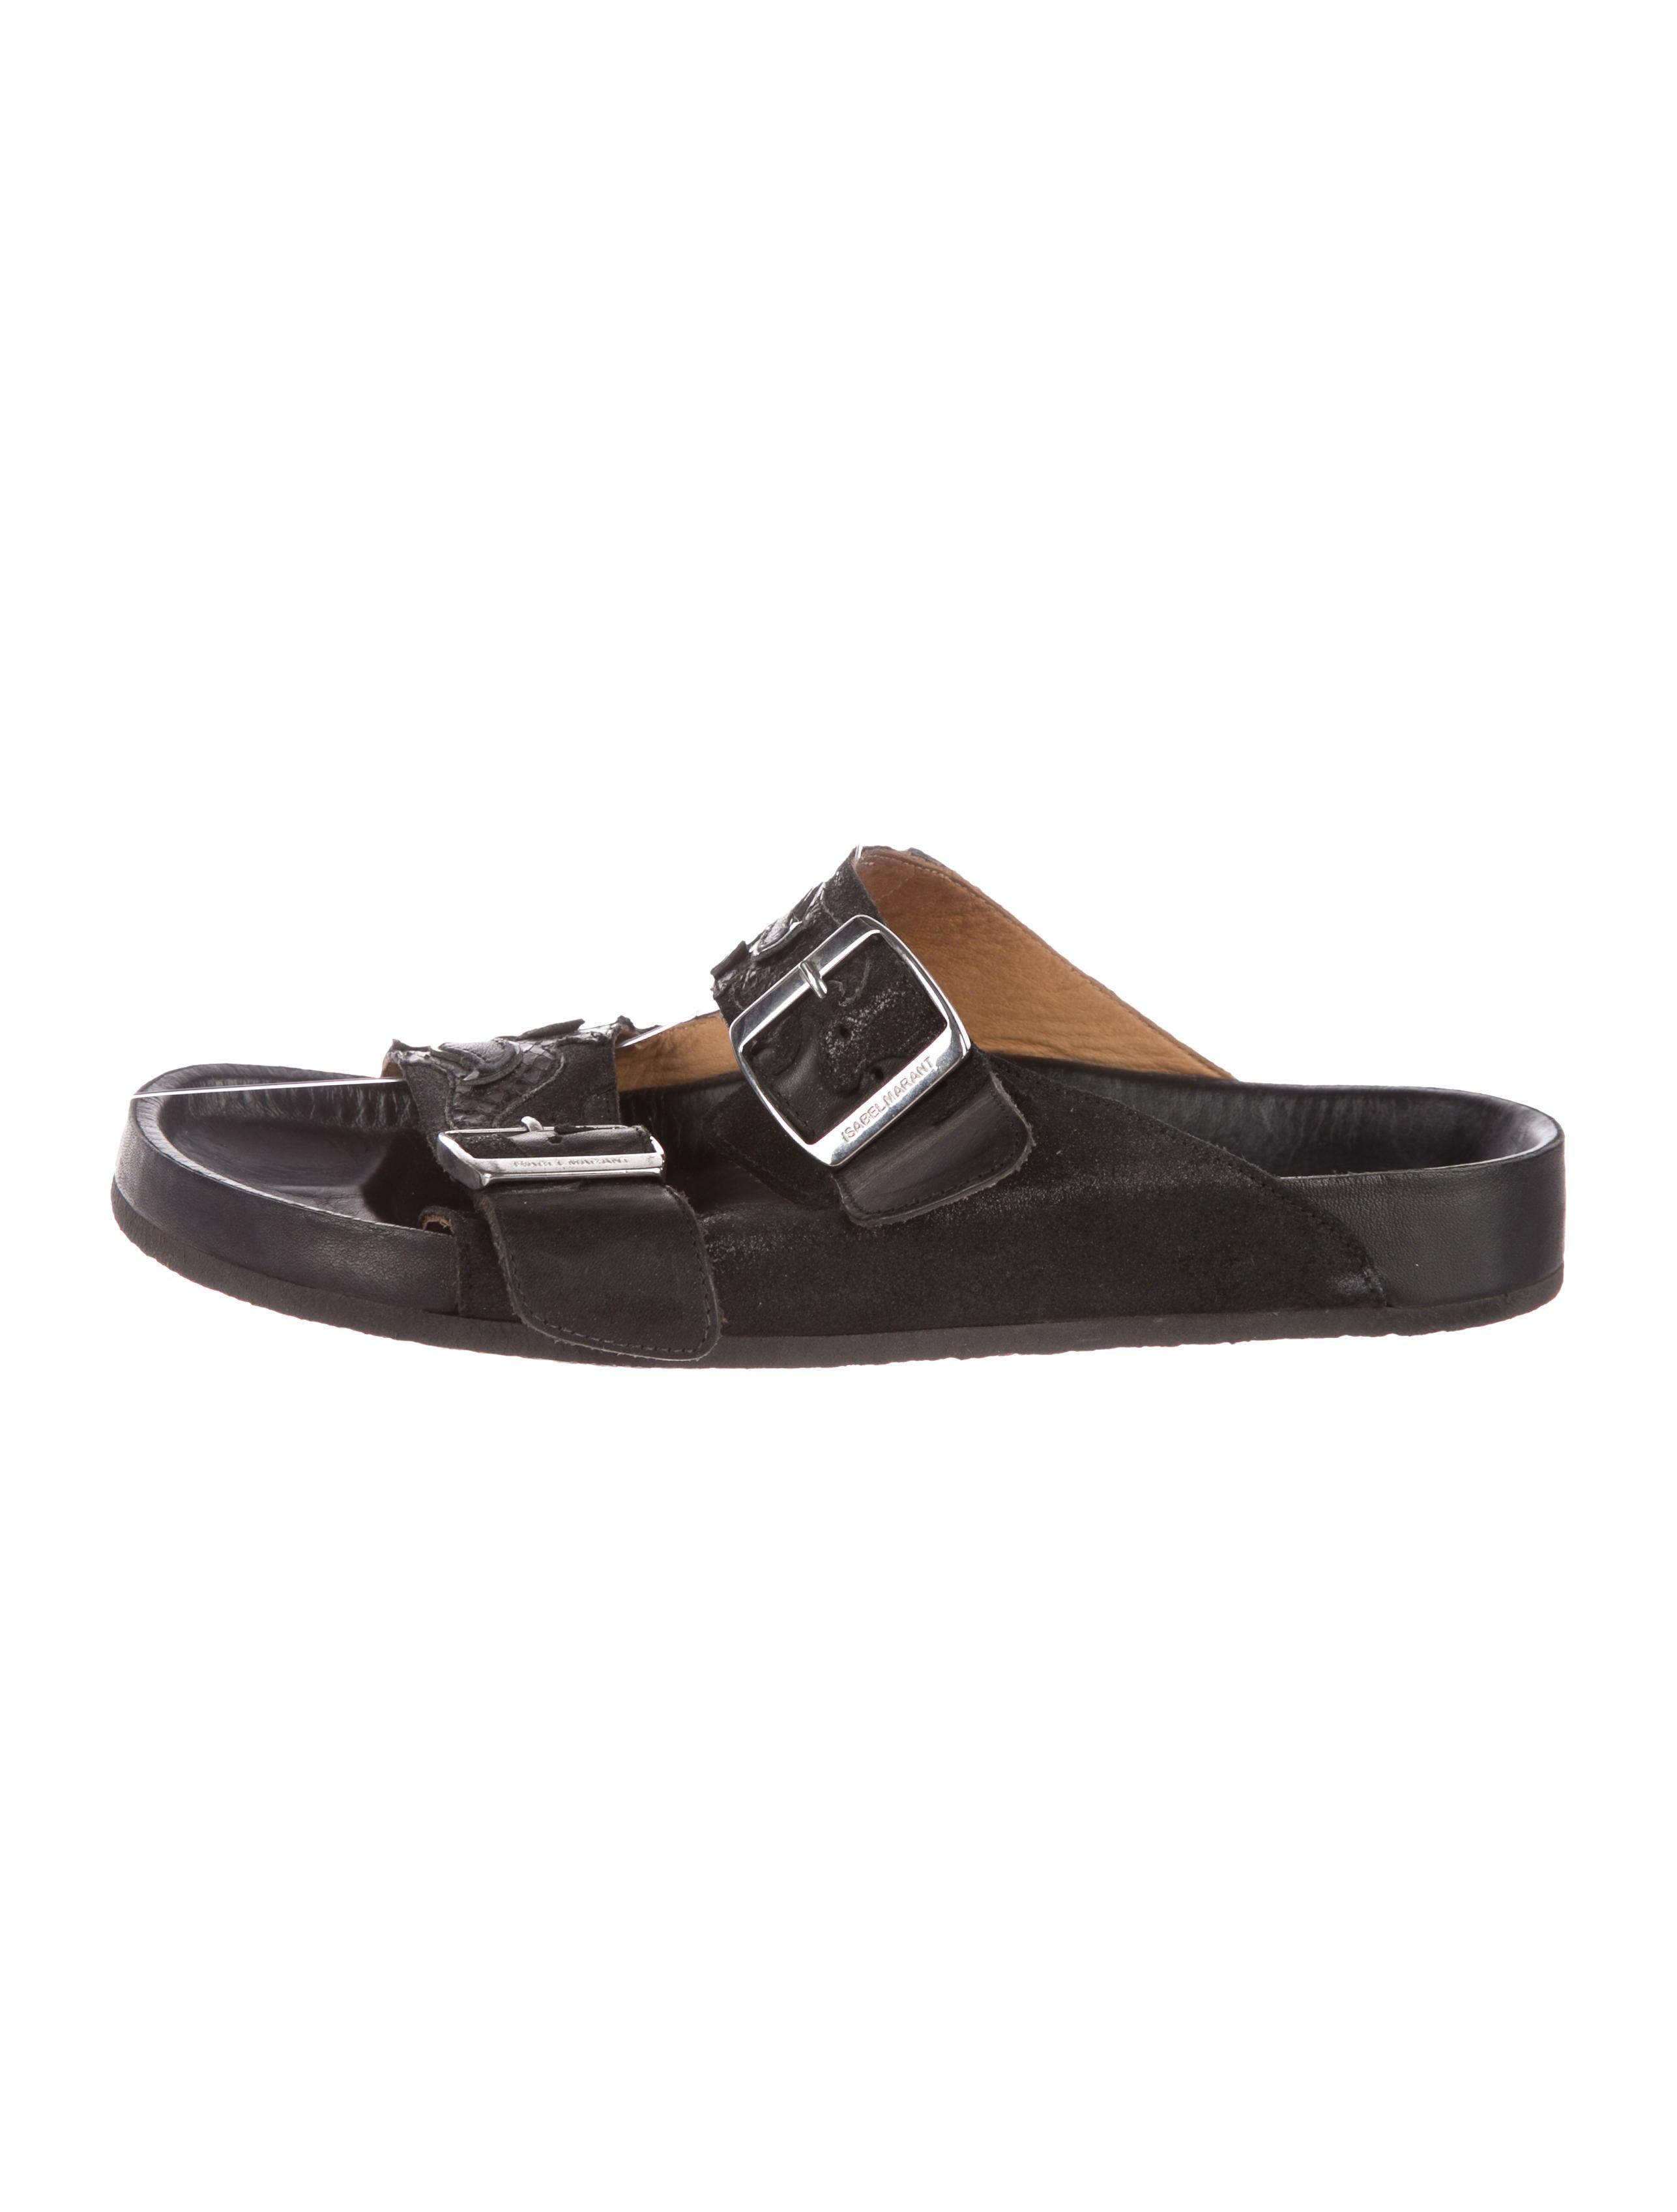 free shipping good selling Étoile Isabel Marant Snakeskin-Trimmed Cholita Sandals official site online sale GImzn